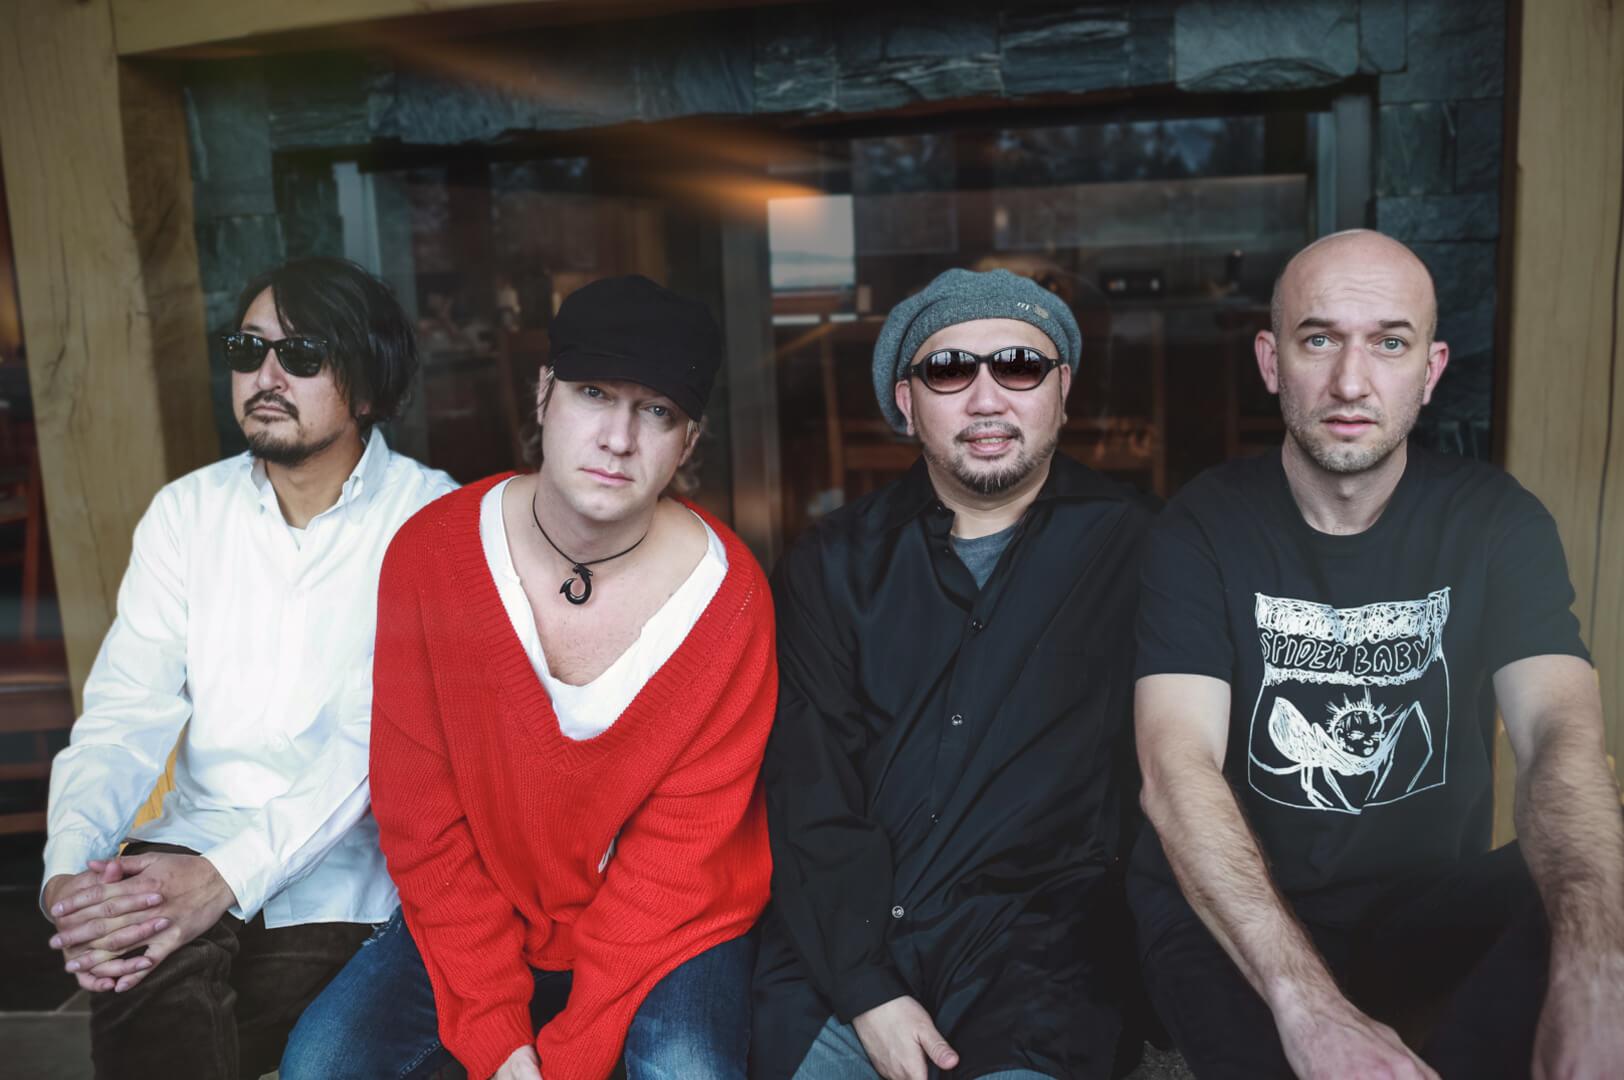 MONKEY MAJIK、最新アルバムより3週連続となる楽曲先行配信が決定&リリース記念イベントの実施も